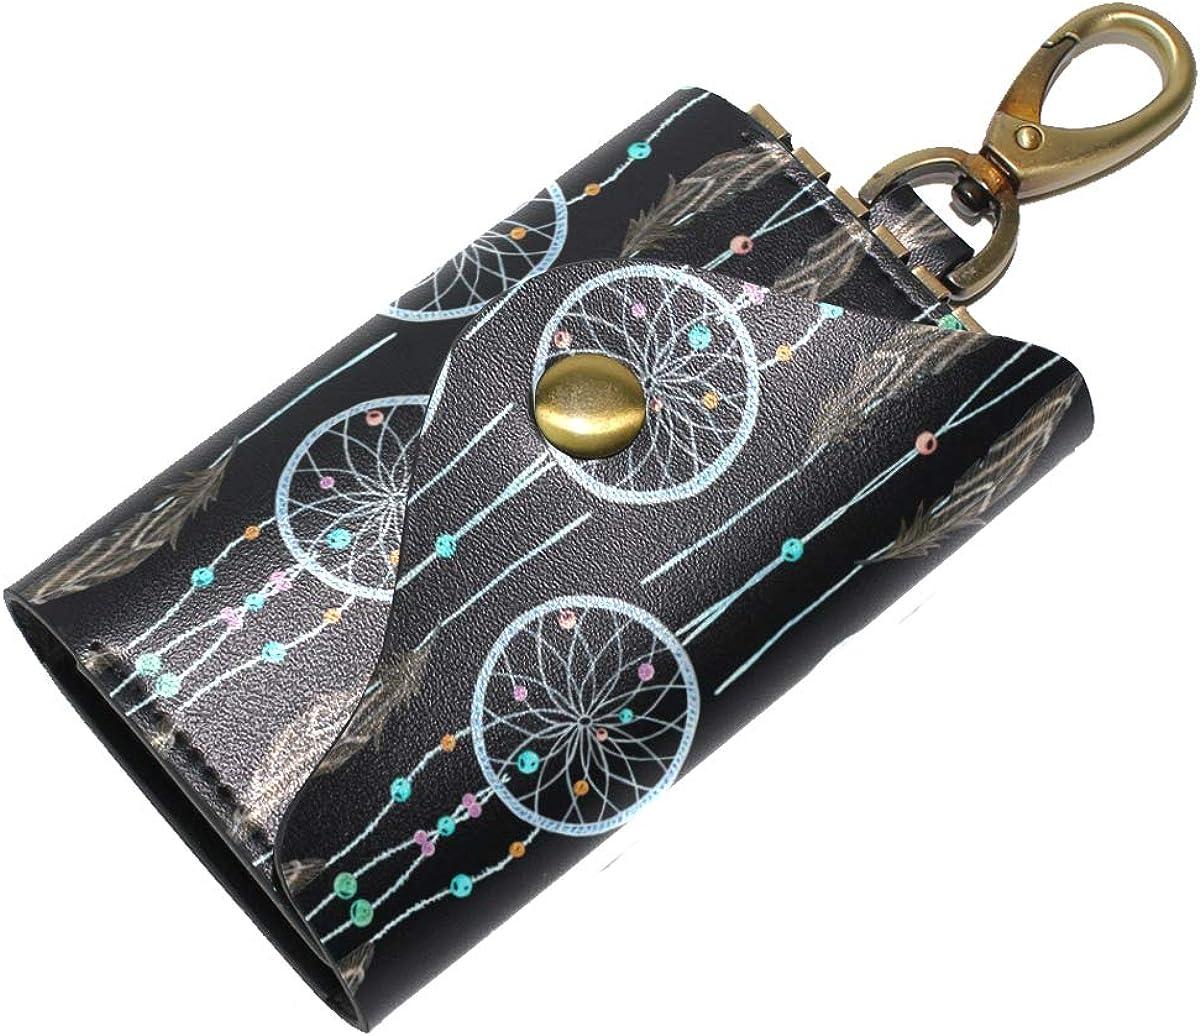 KEAKIA Watercolor Dreamcatcher Pattern Leather Key Case Wallets Tri-fold Key Holder Keychains with 6 Hooks 2 Slot Snap Closure for Men Women